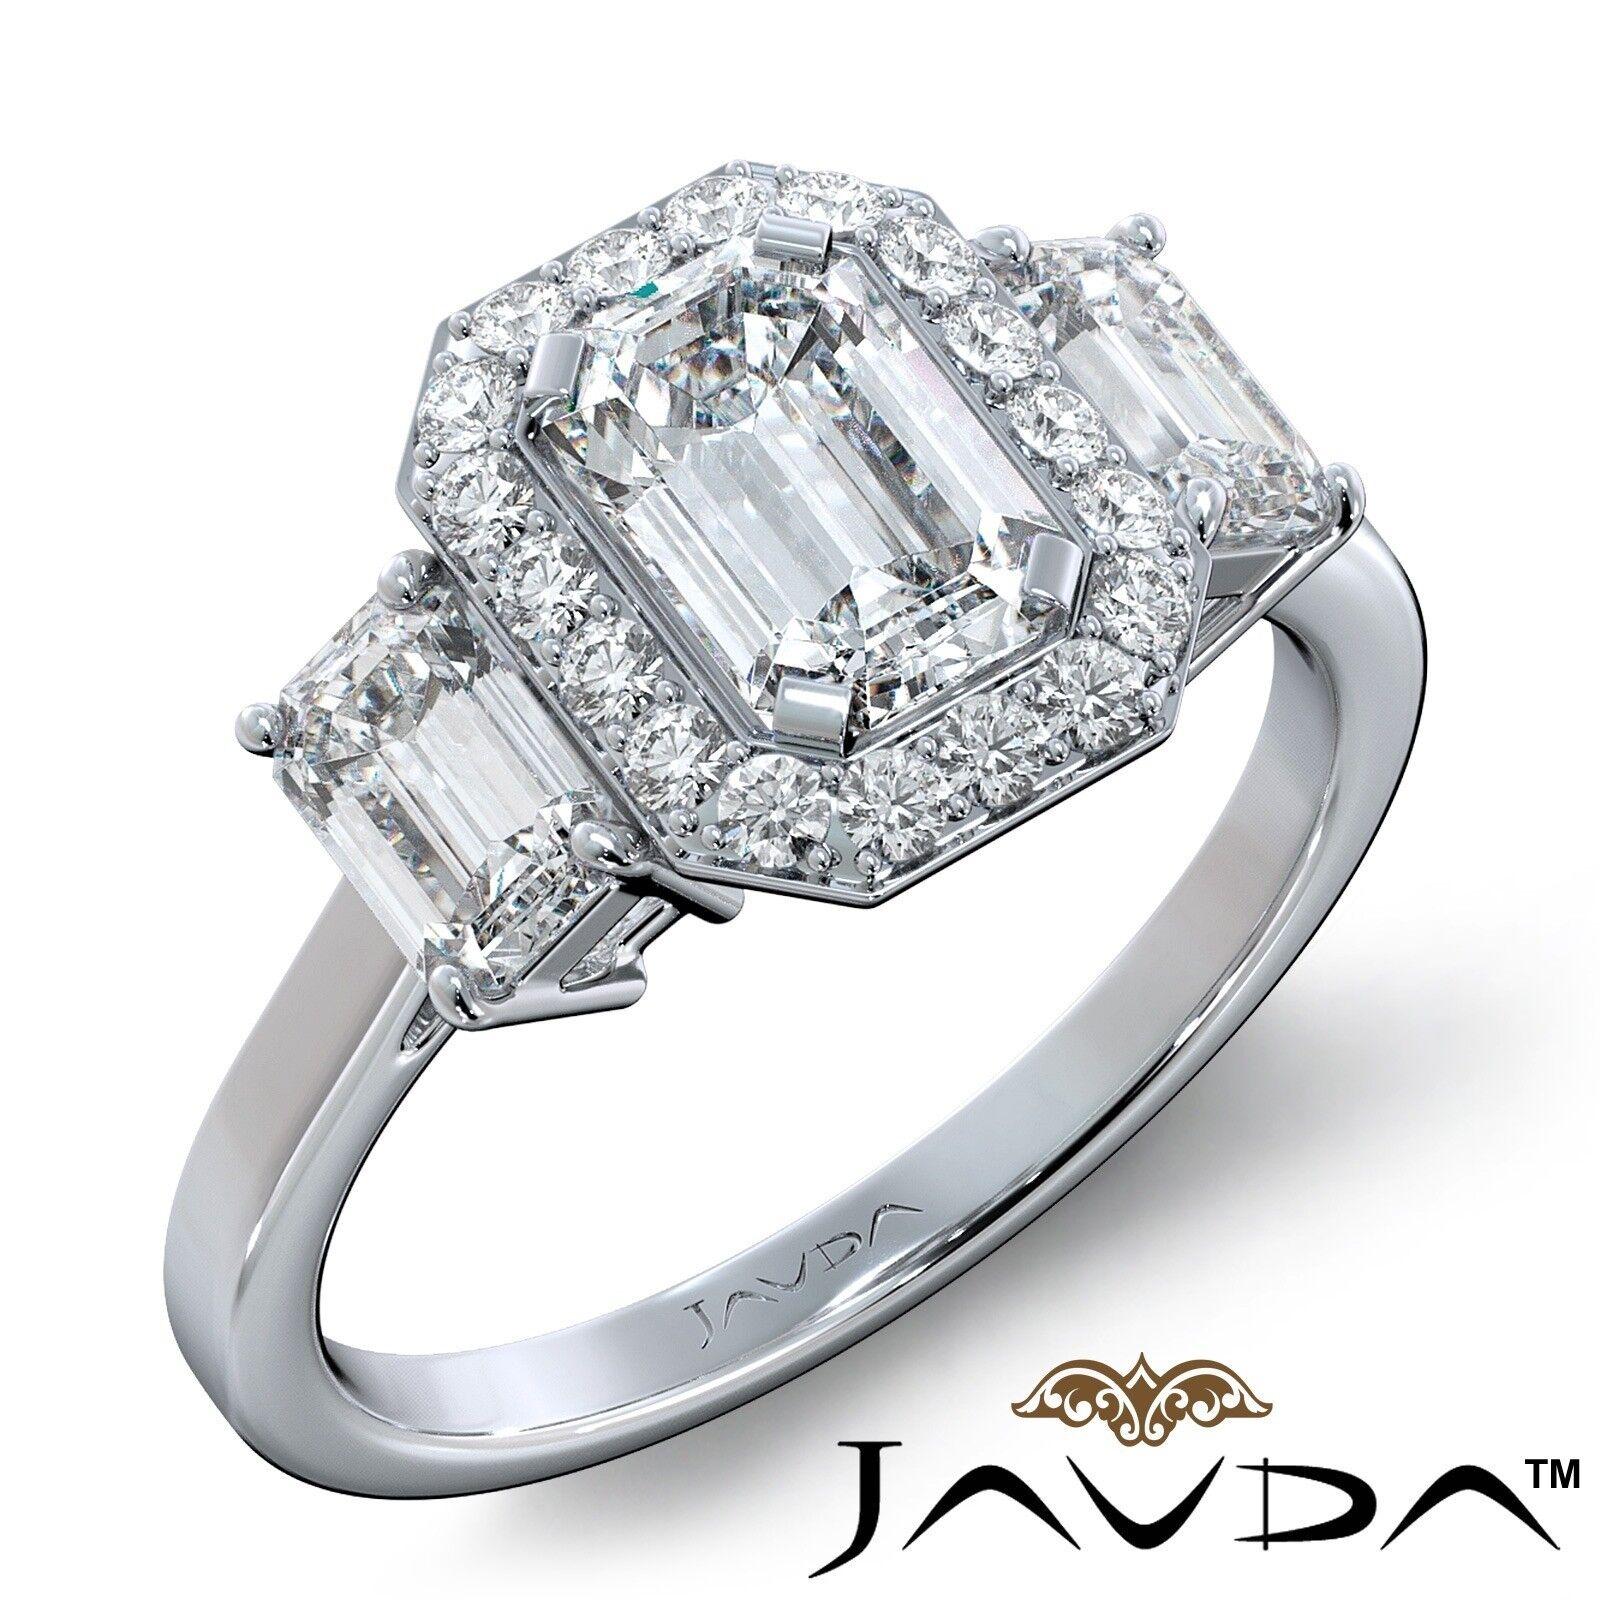 1.64ctw 3 Stone Halo Pave Emerald Diamond Engagement Ring GIA J-SI2 White Gold